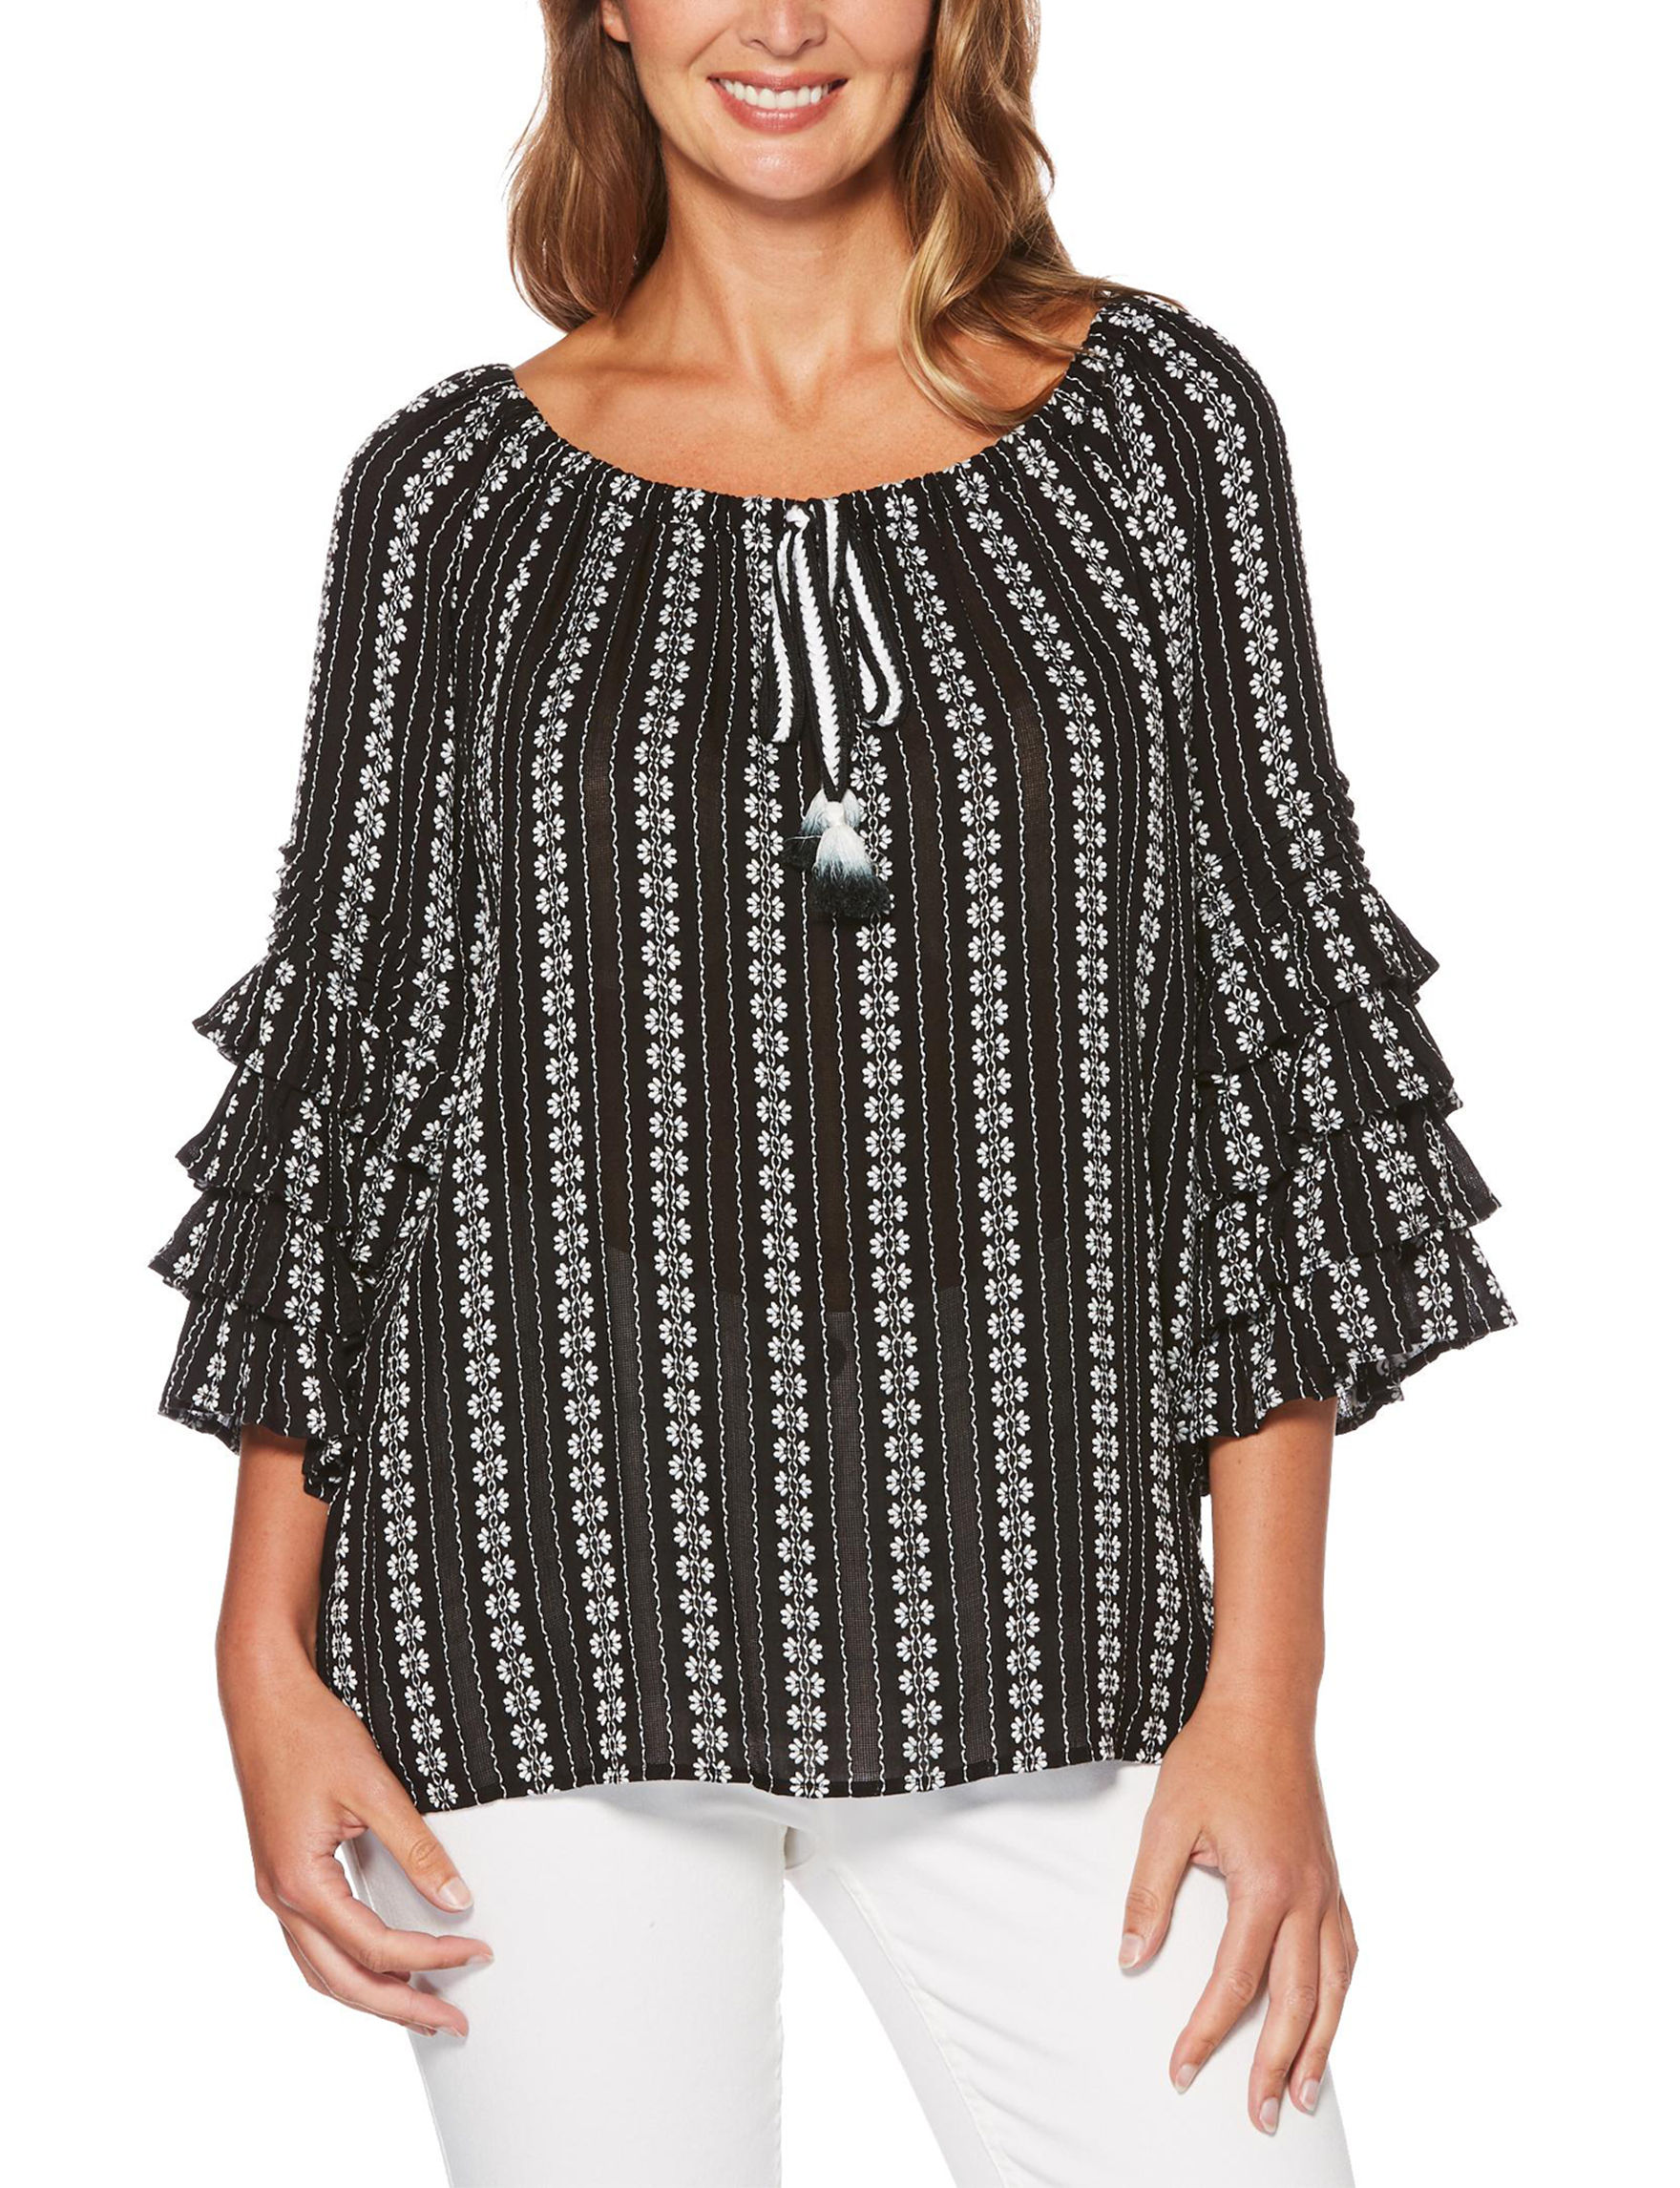 Rafaella Black / White Shirts & Blouses